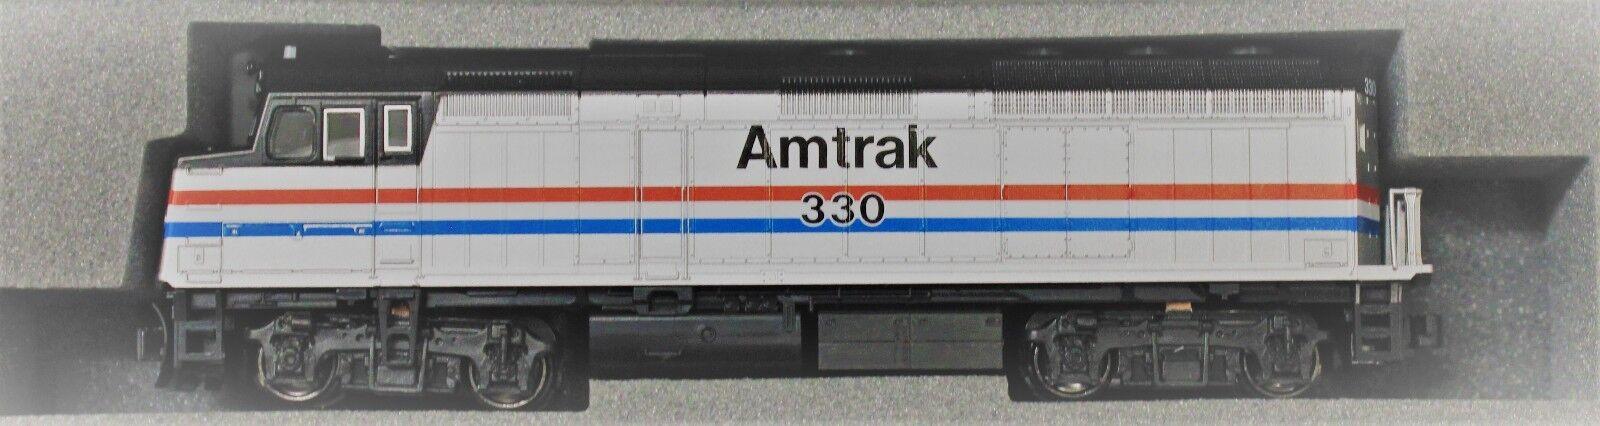 N Scale - KATO 176-6105 AMTRAK Phase III III III F40PH Locomotive DCC Ready 74f2cc